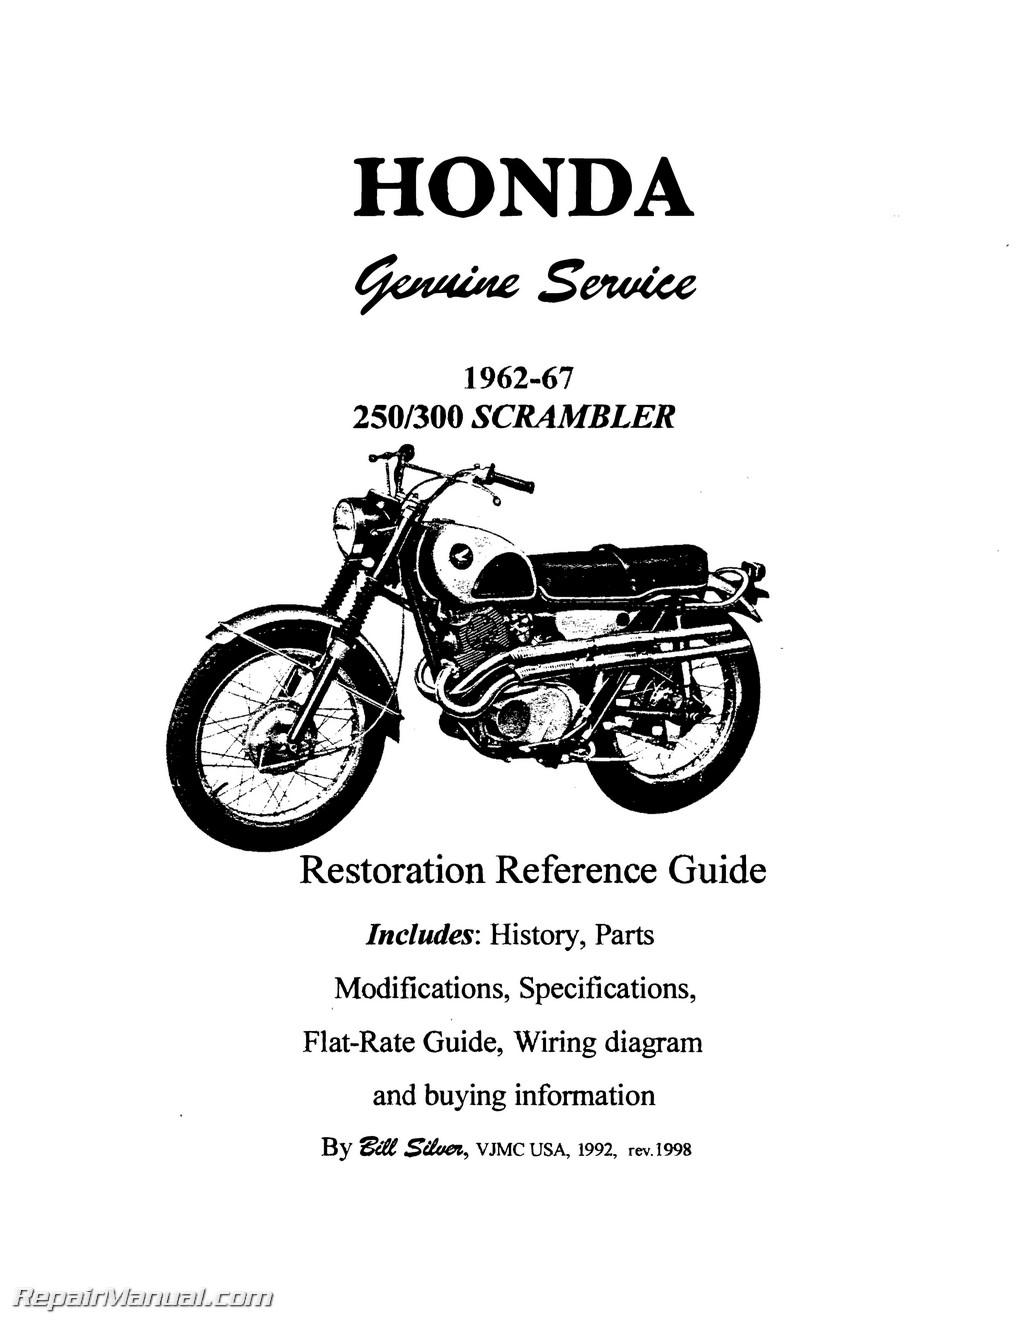 Honda Superhawk Scrambler Motorcycle Restoration Reference